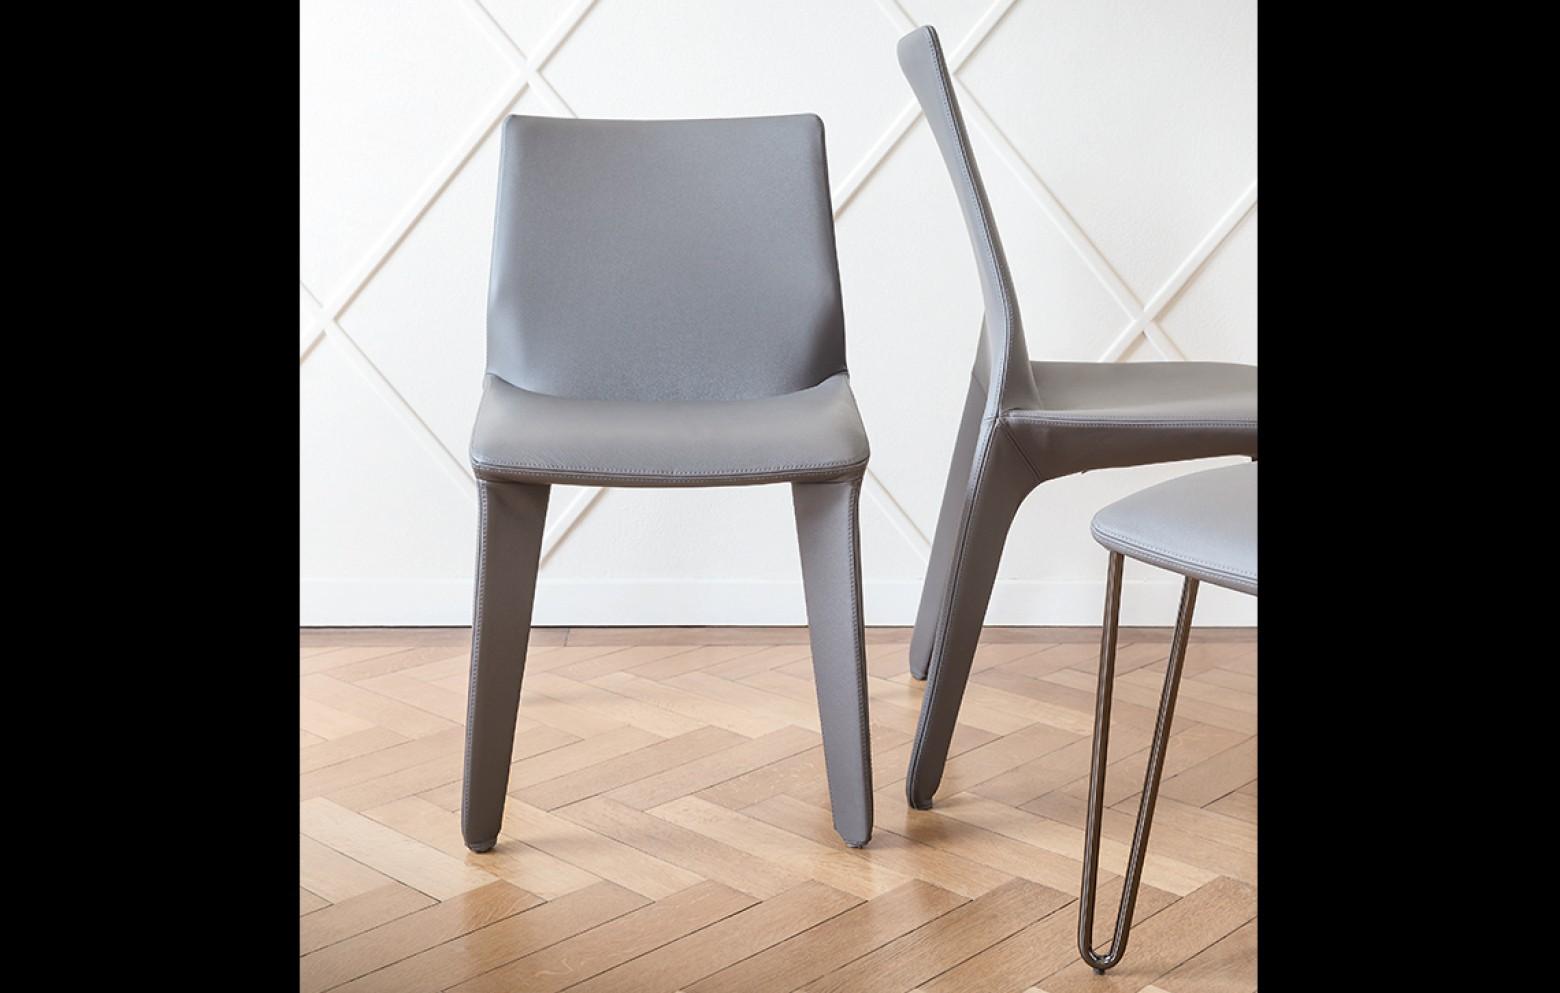 HERON | Stühle | Tische & Stühle | Who\'s perfect.